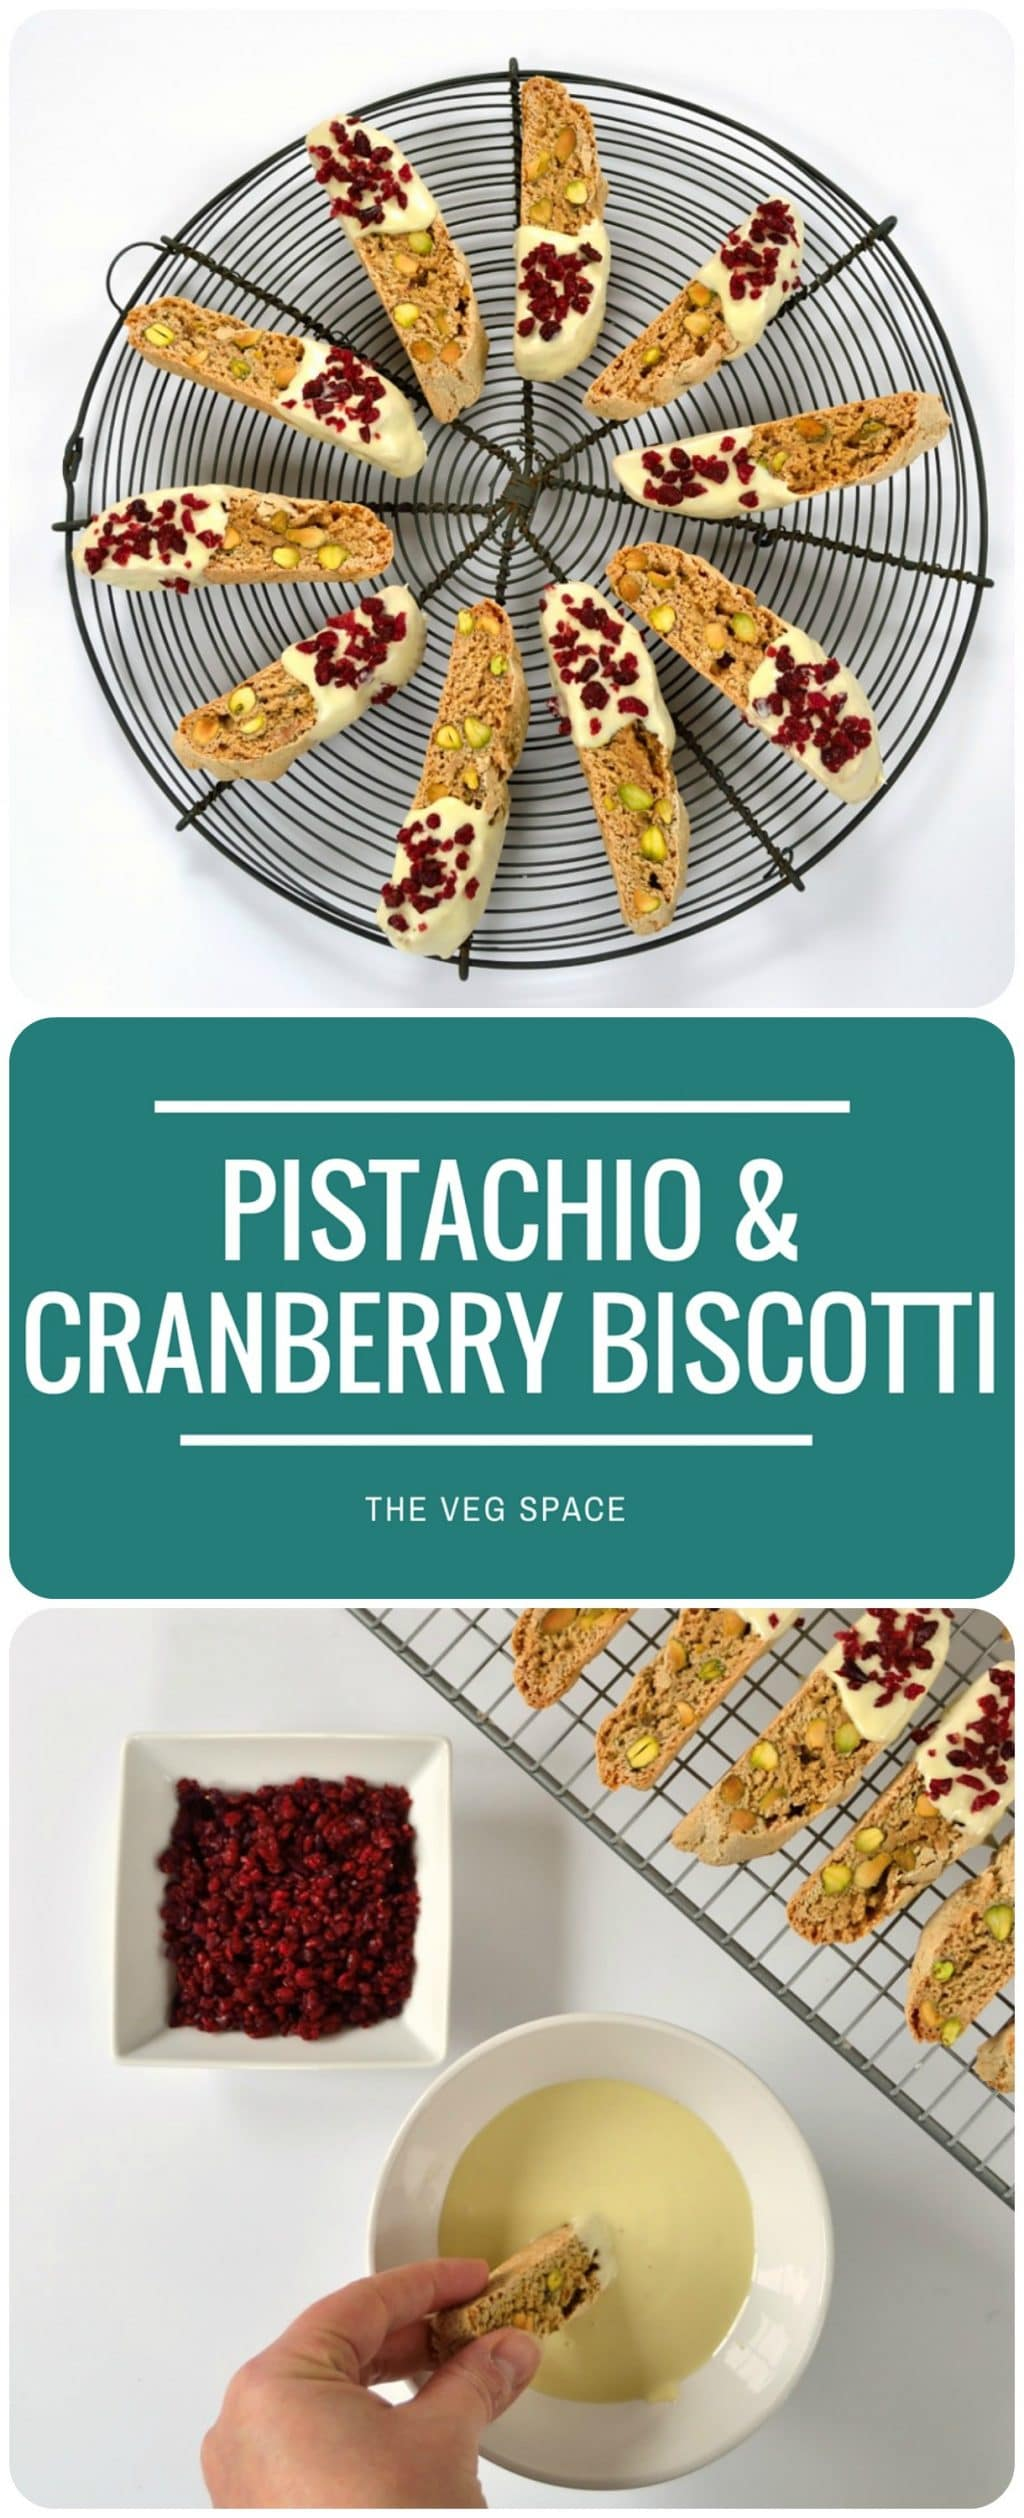 Recipe: Pistachio & Cranberry Biscotti - The Veg Space